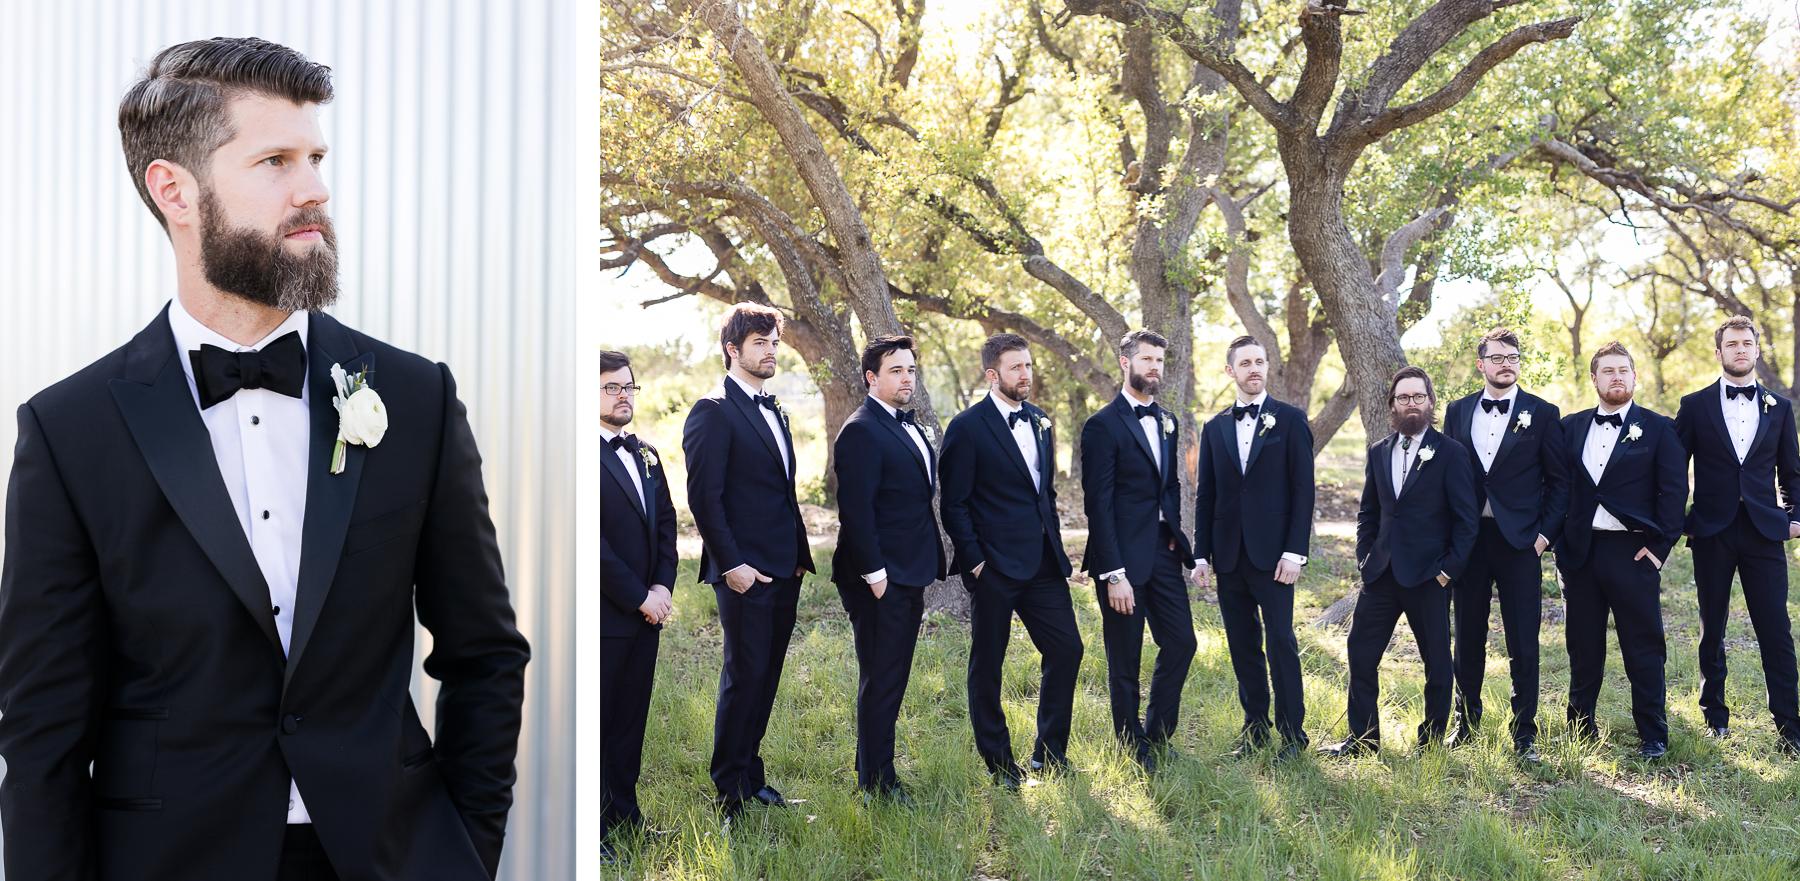 austin-texas-wedding-photo-and-video.jpg